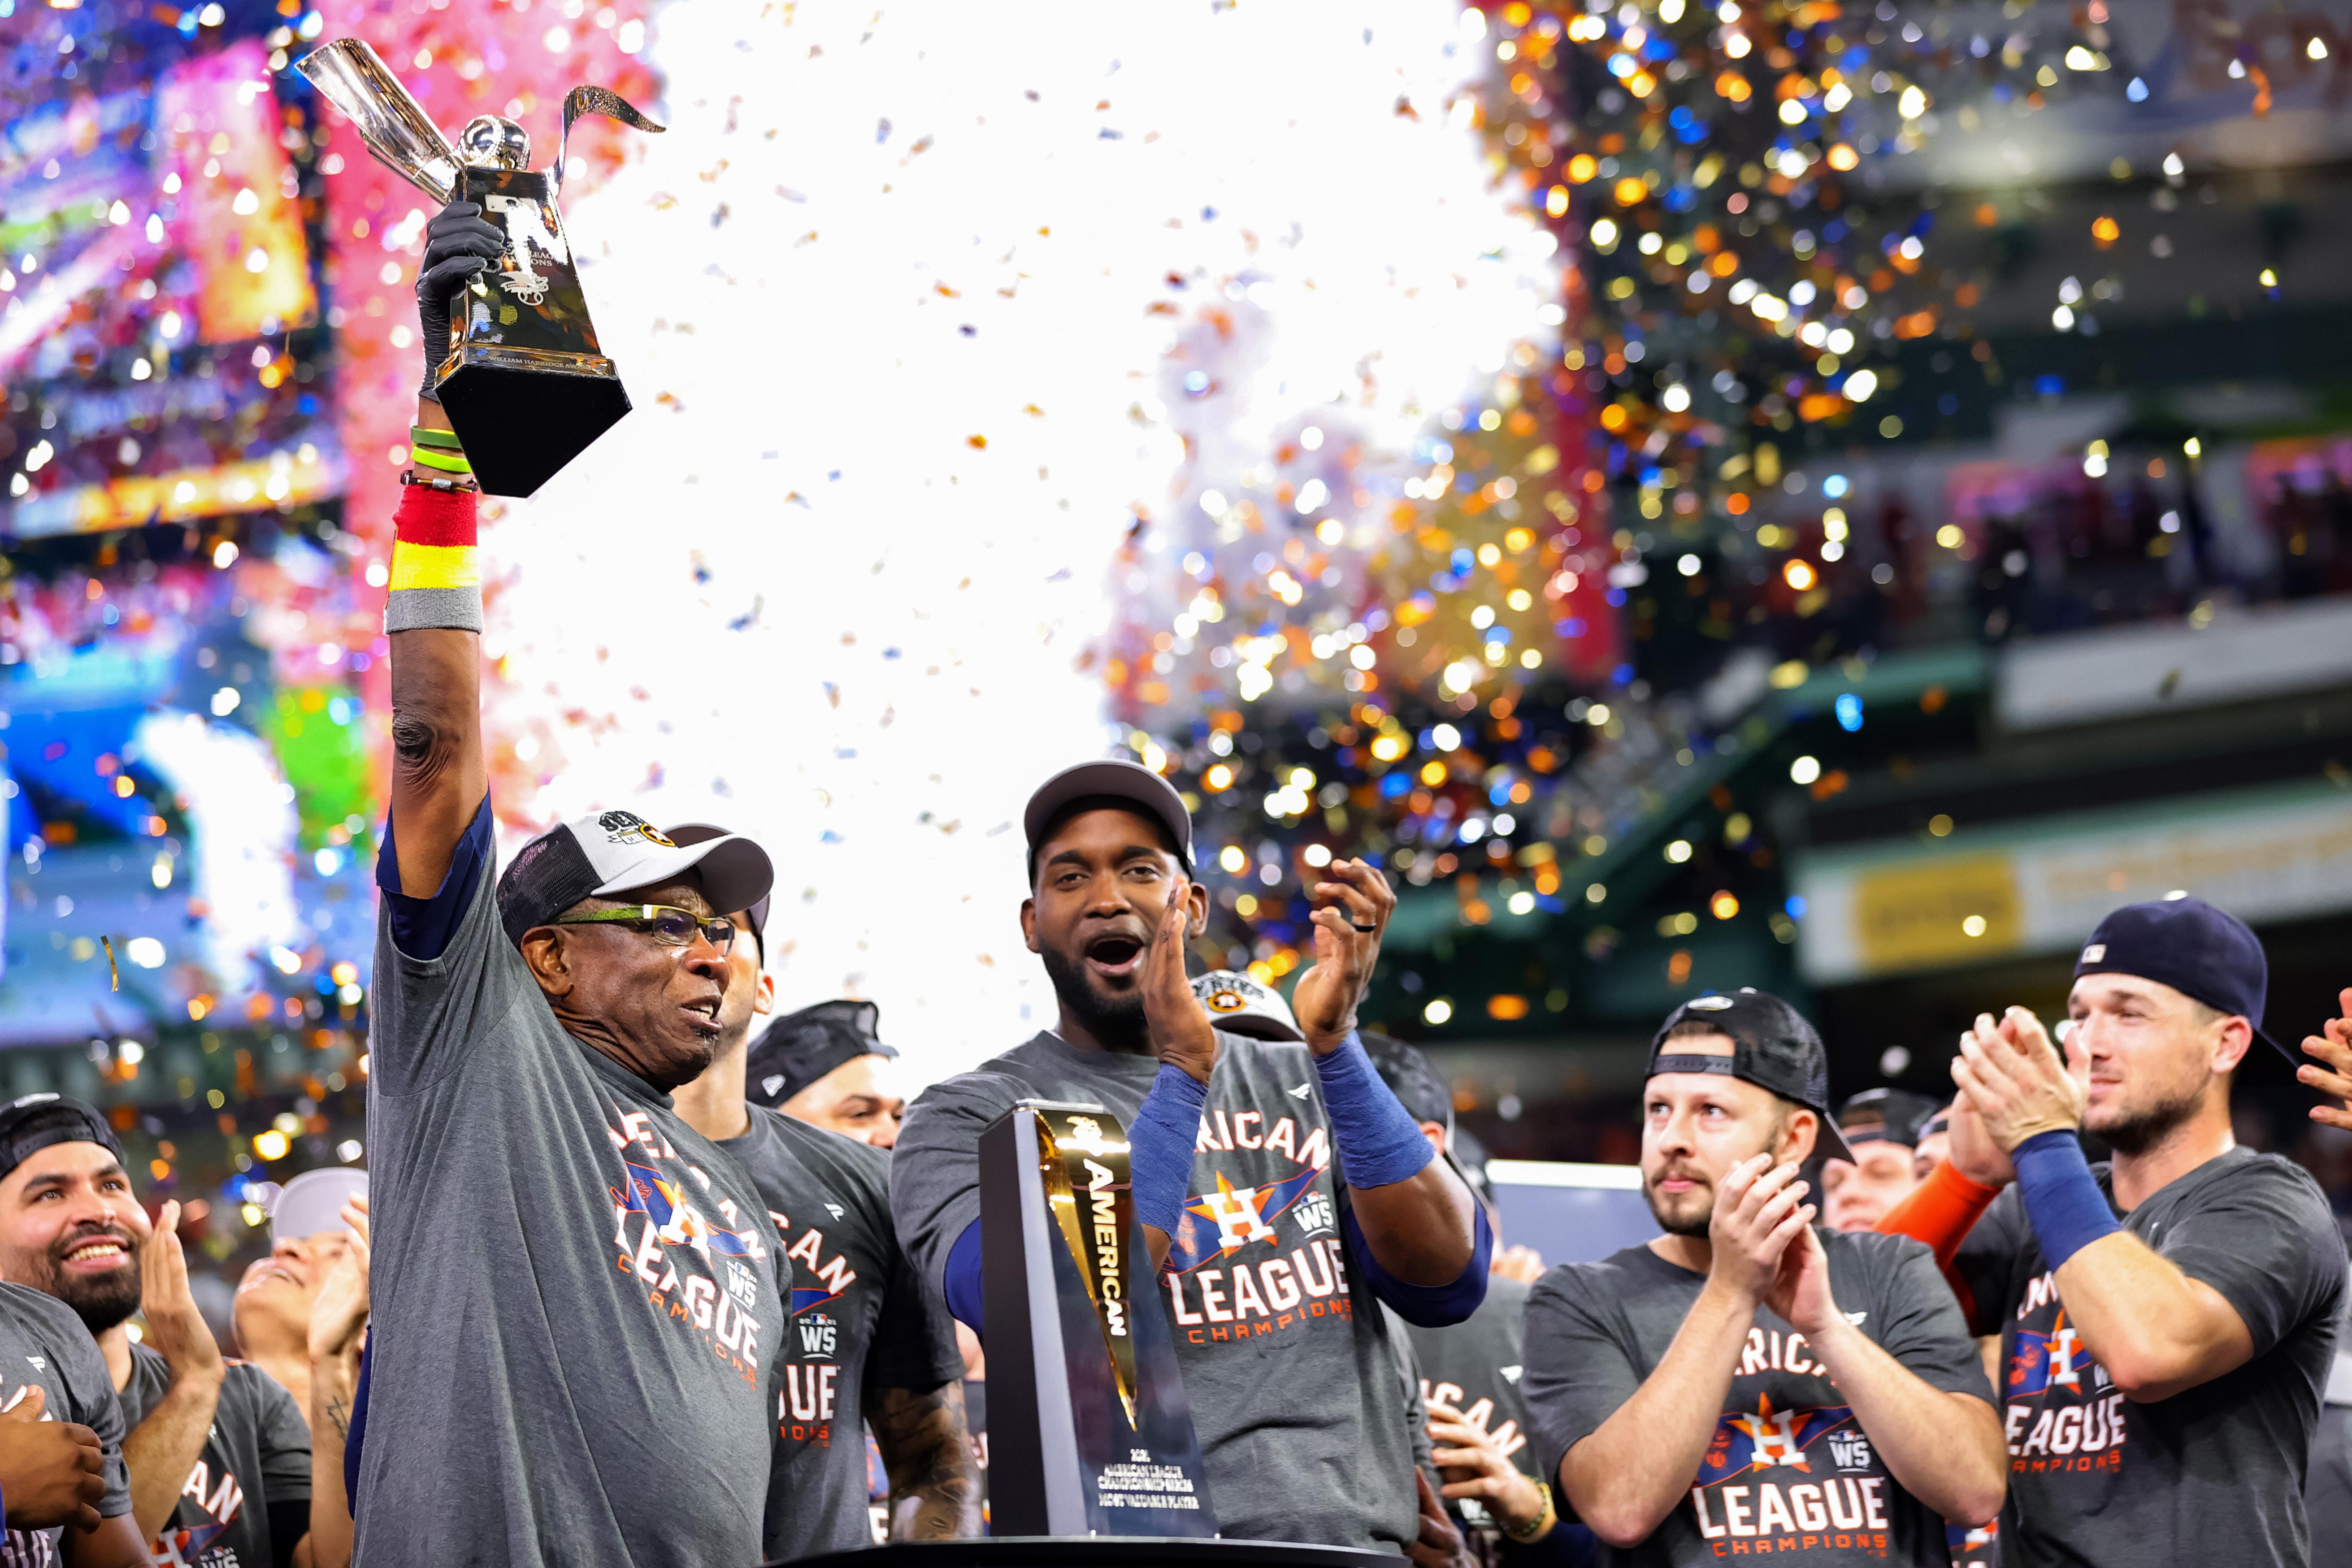 Championship Series - Boston Red Sox v Houston Astros - Game Six